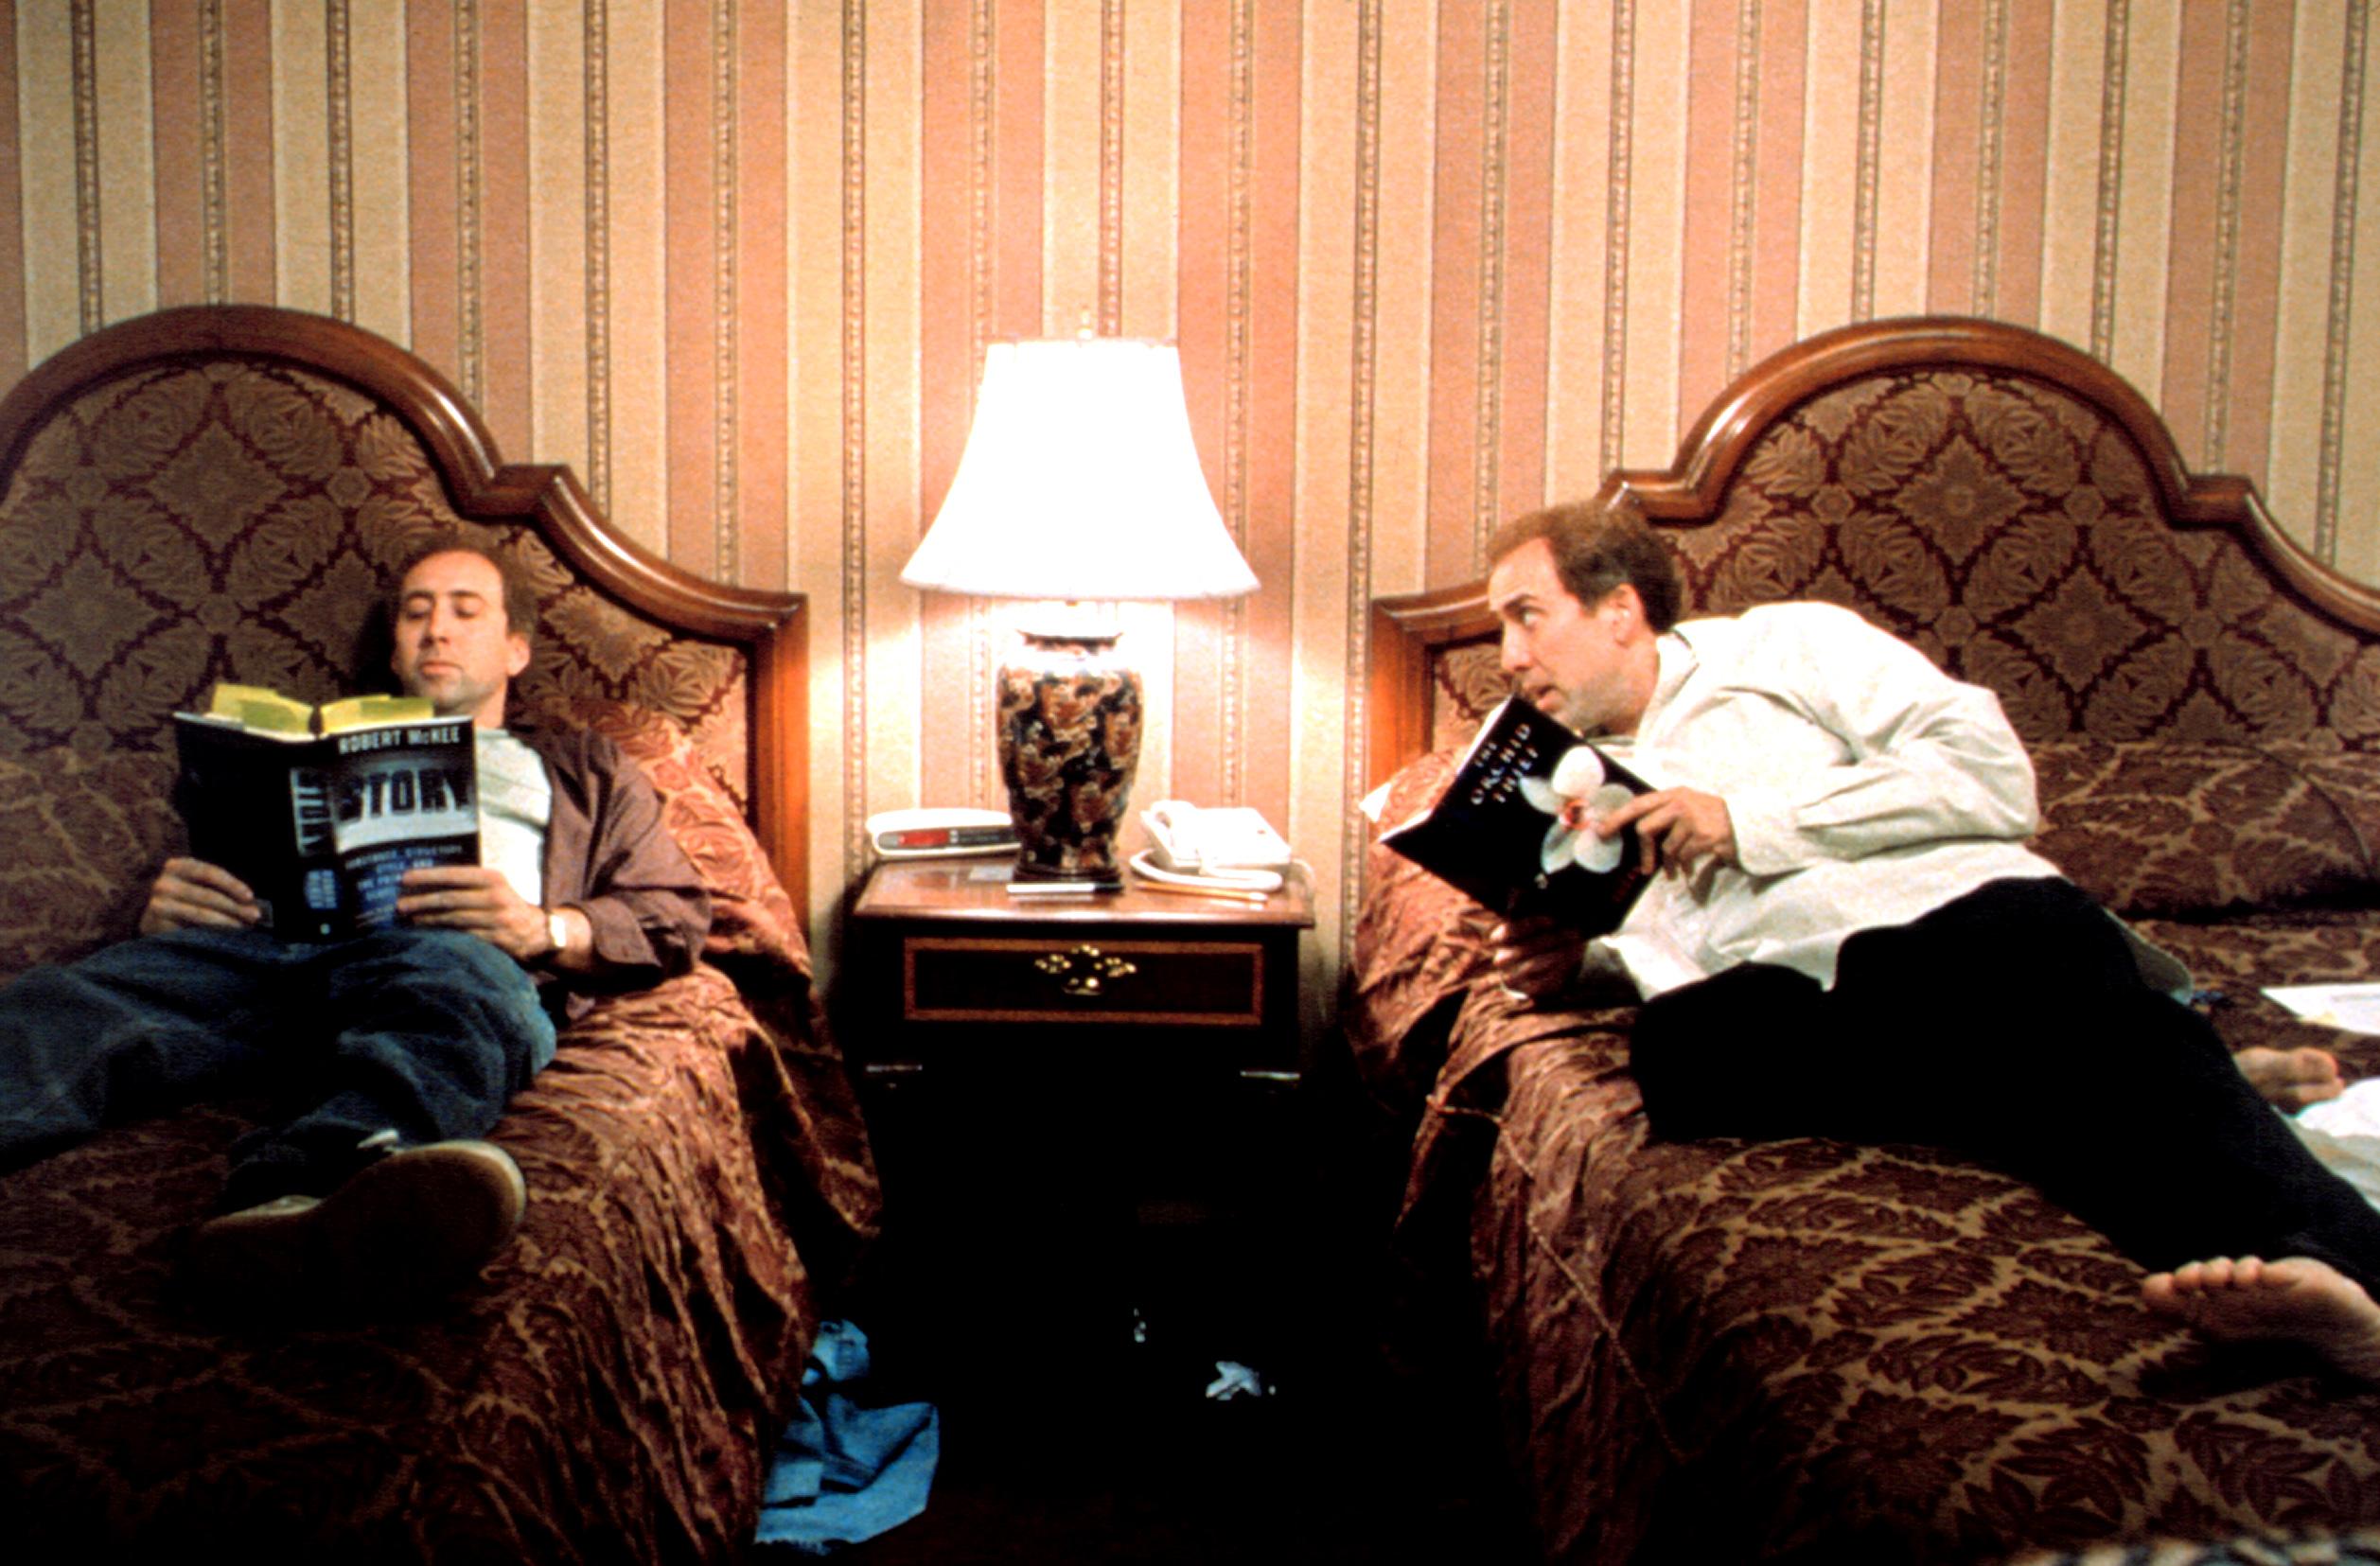 ADAPTATION, Nicolas Cage, 2002, (c) Columbia/courtesy Everett Collection